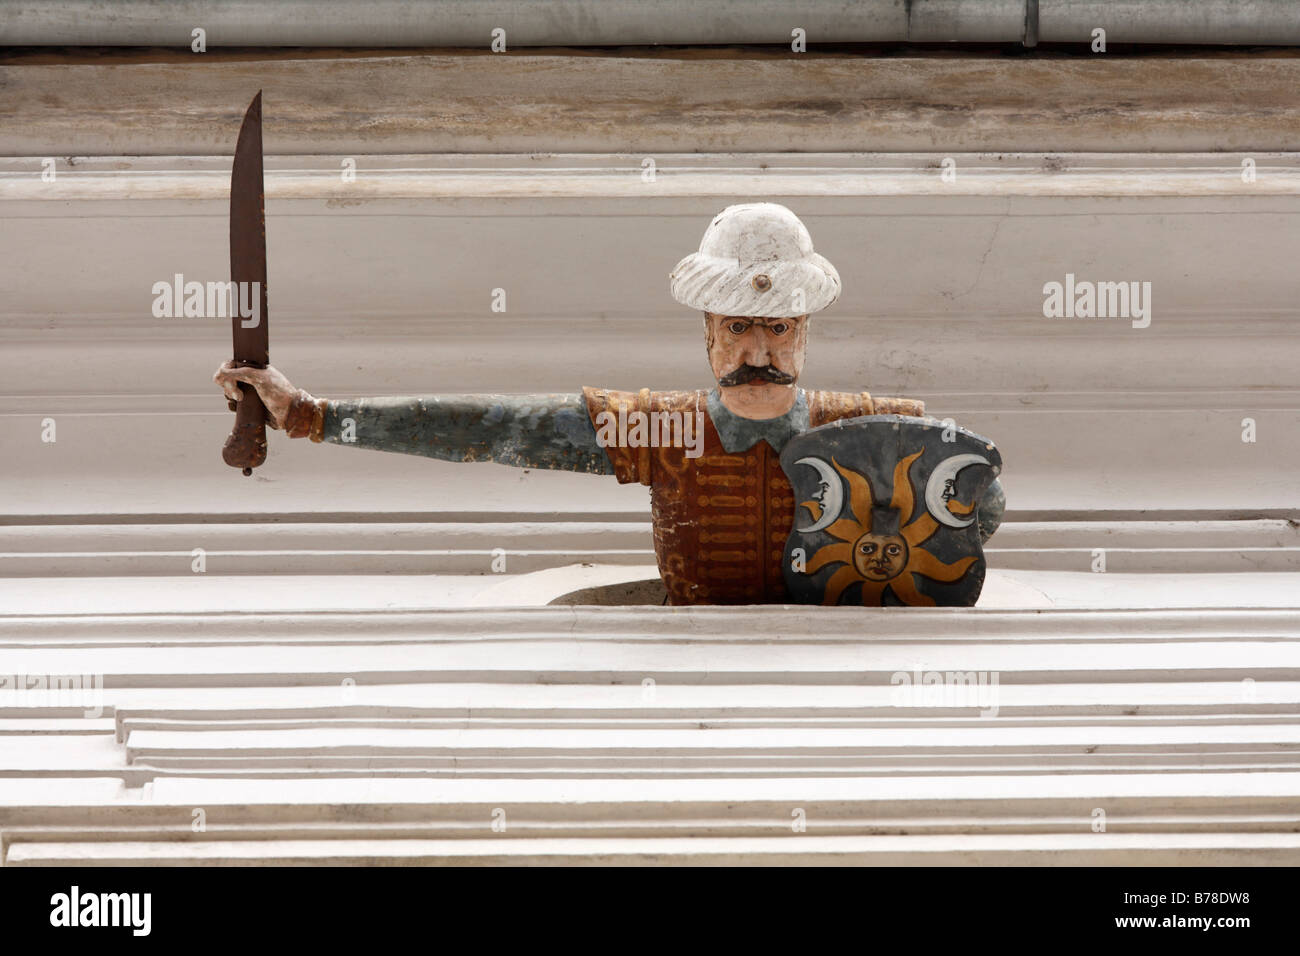 The Turk, a wooden figure on Palais Saurau in Sporgasse, Graz, Styria, Austria, Europe - Stock Image